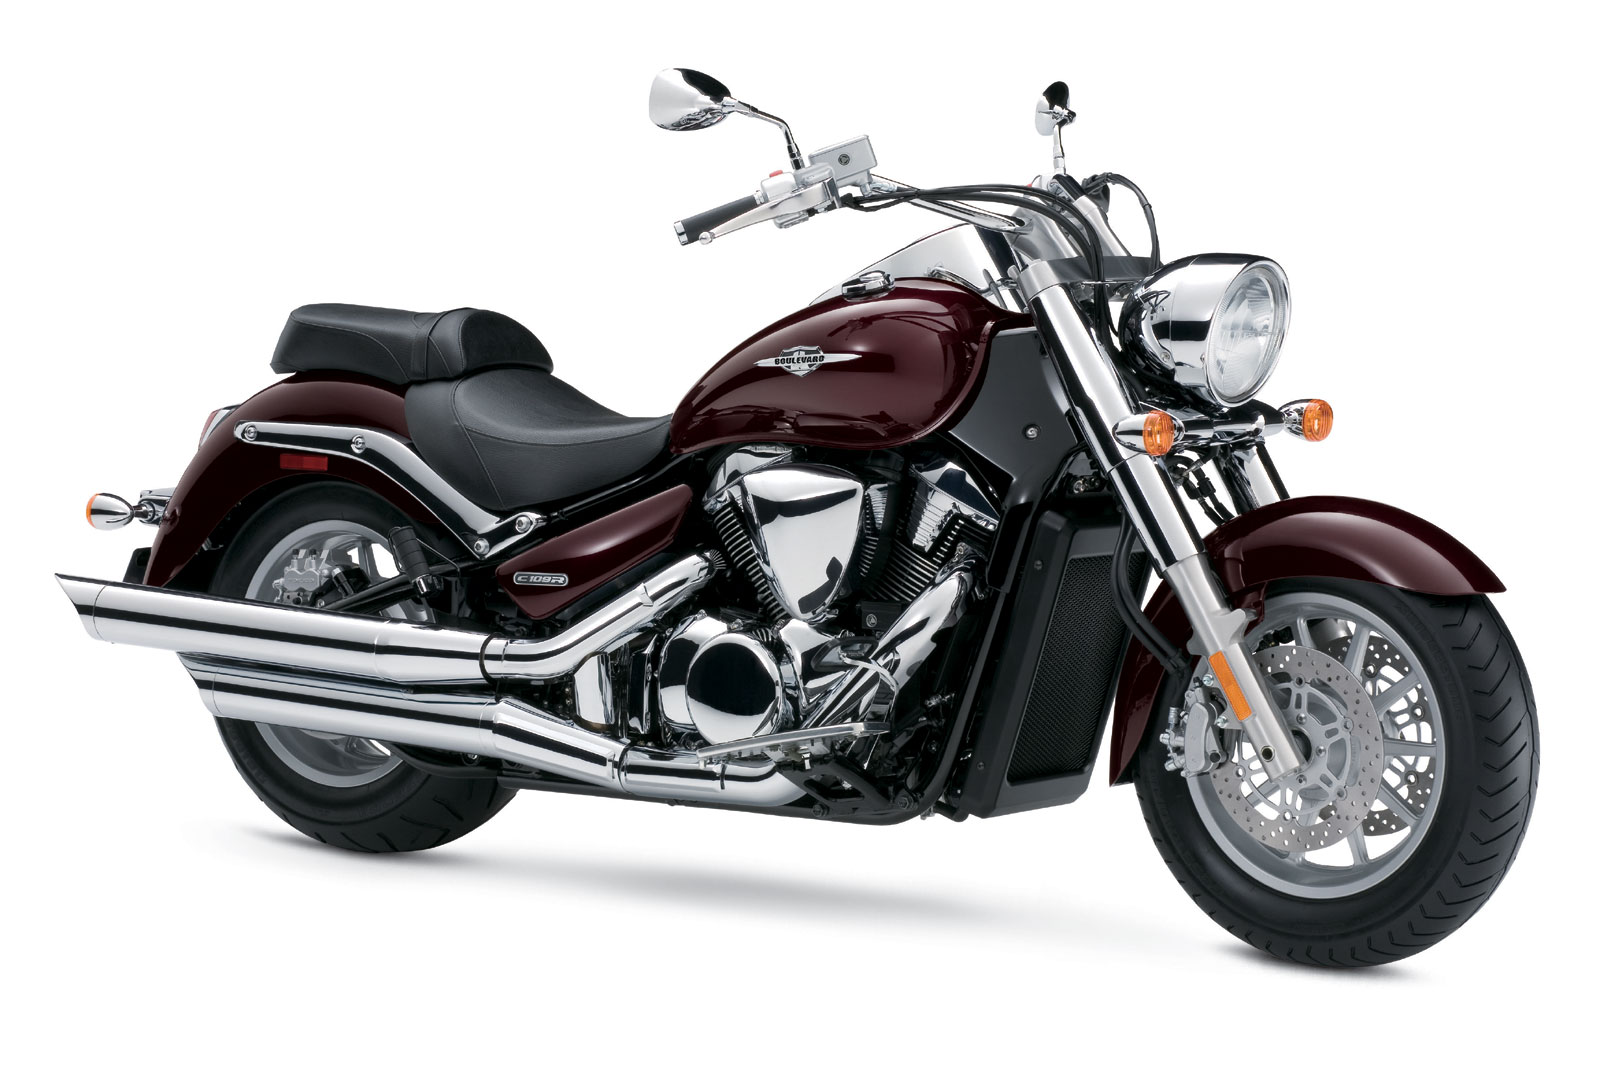 suzuki 1800 cc blvd clutch problems and review | motorcycle maniac ...